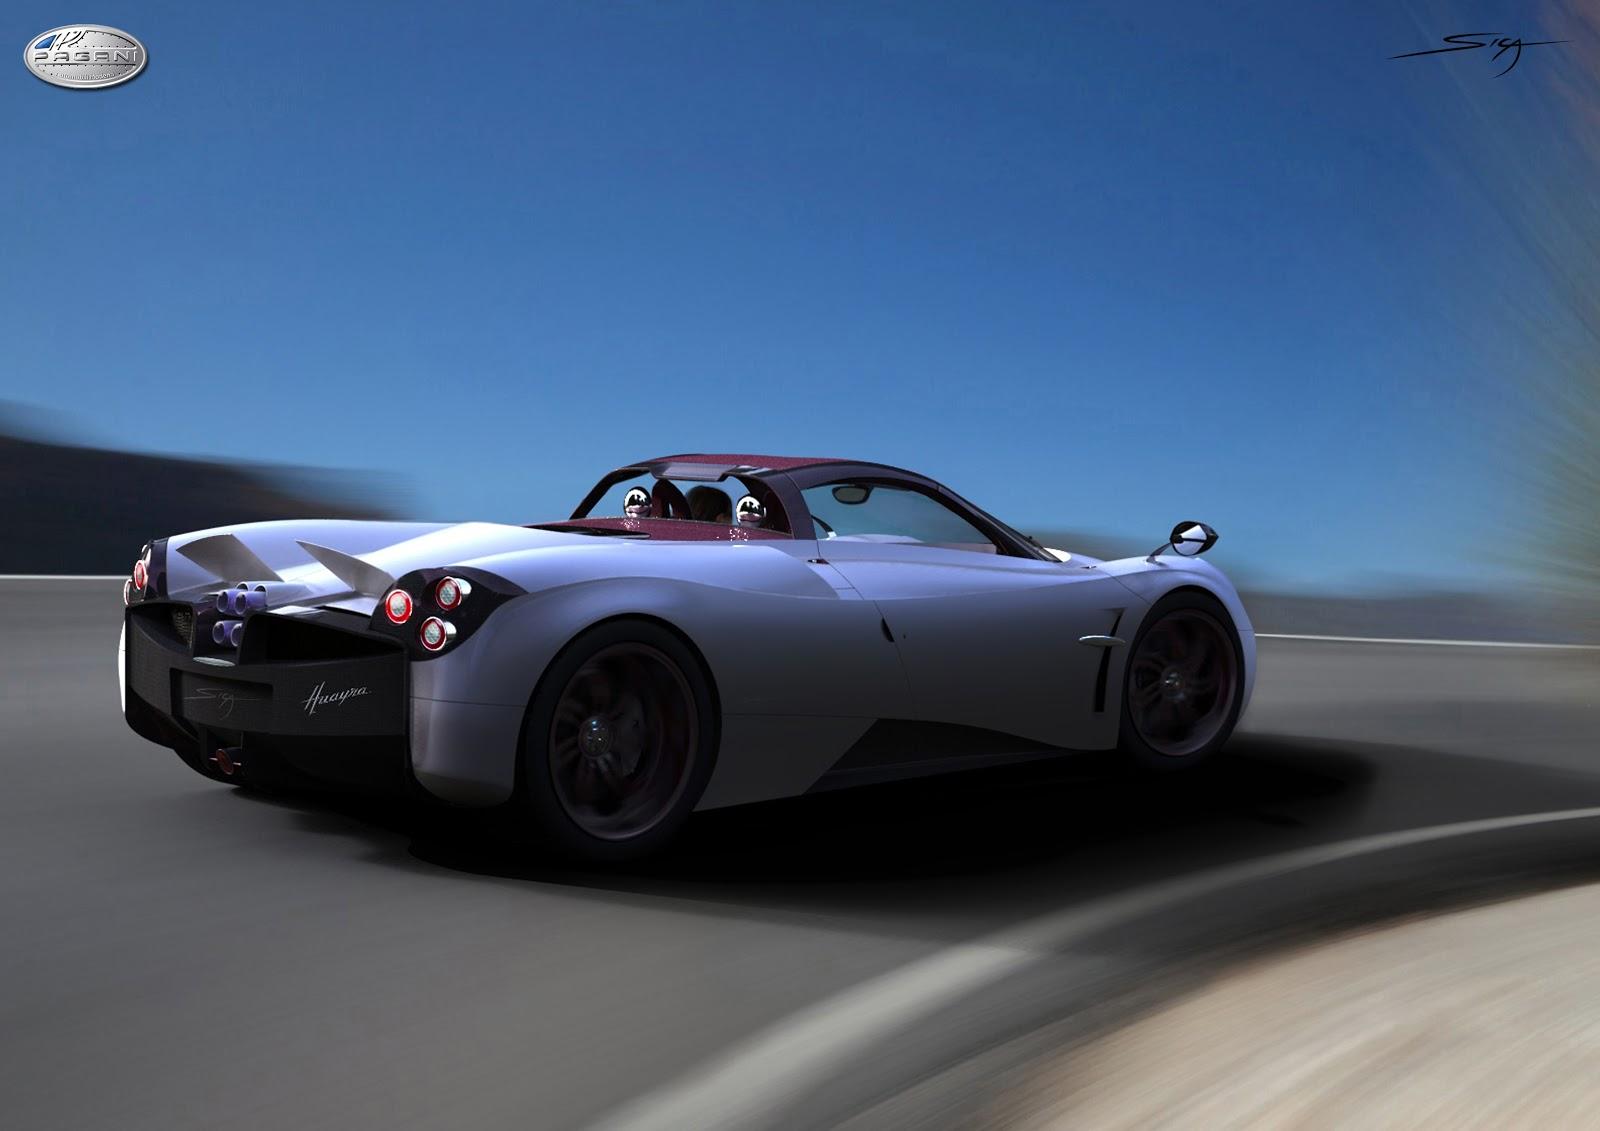 Pagani Huraya >> Pagani: Huayra Roadster to Arrive by 2017 - autoevolution